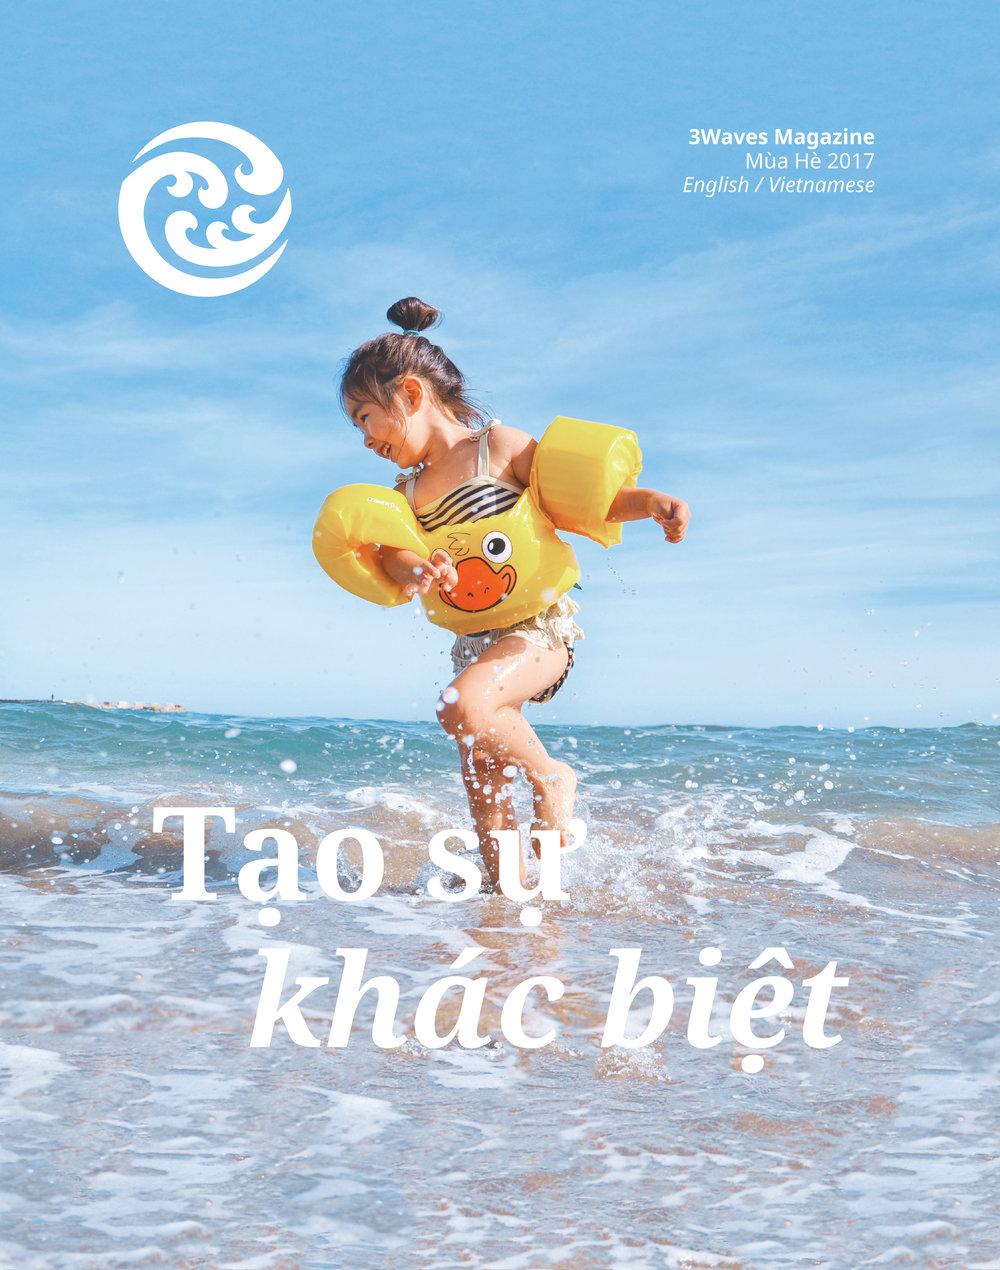 Issue 11 - June 2017: Vietnamese